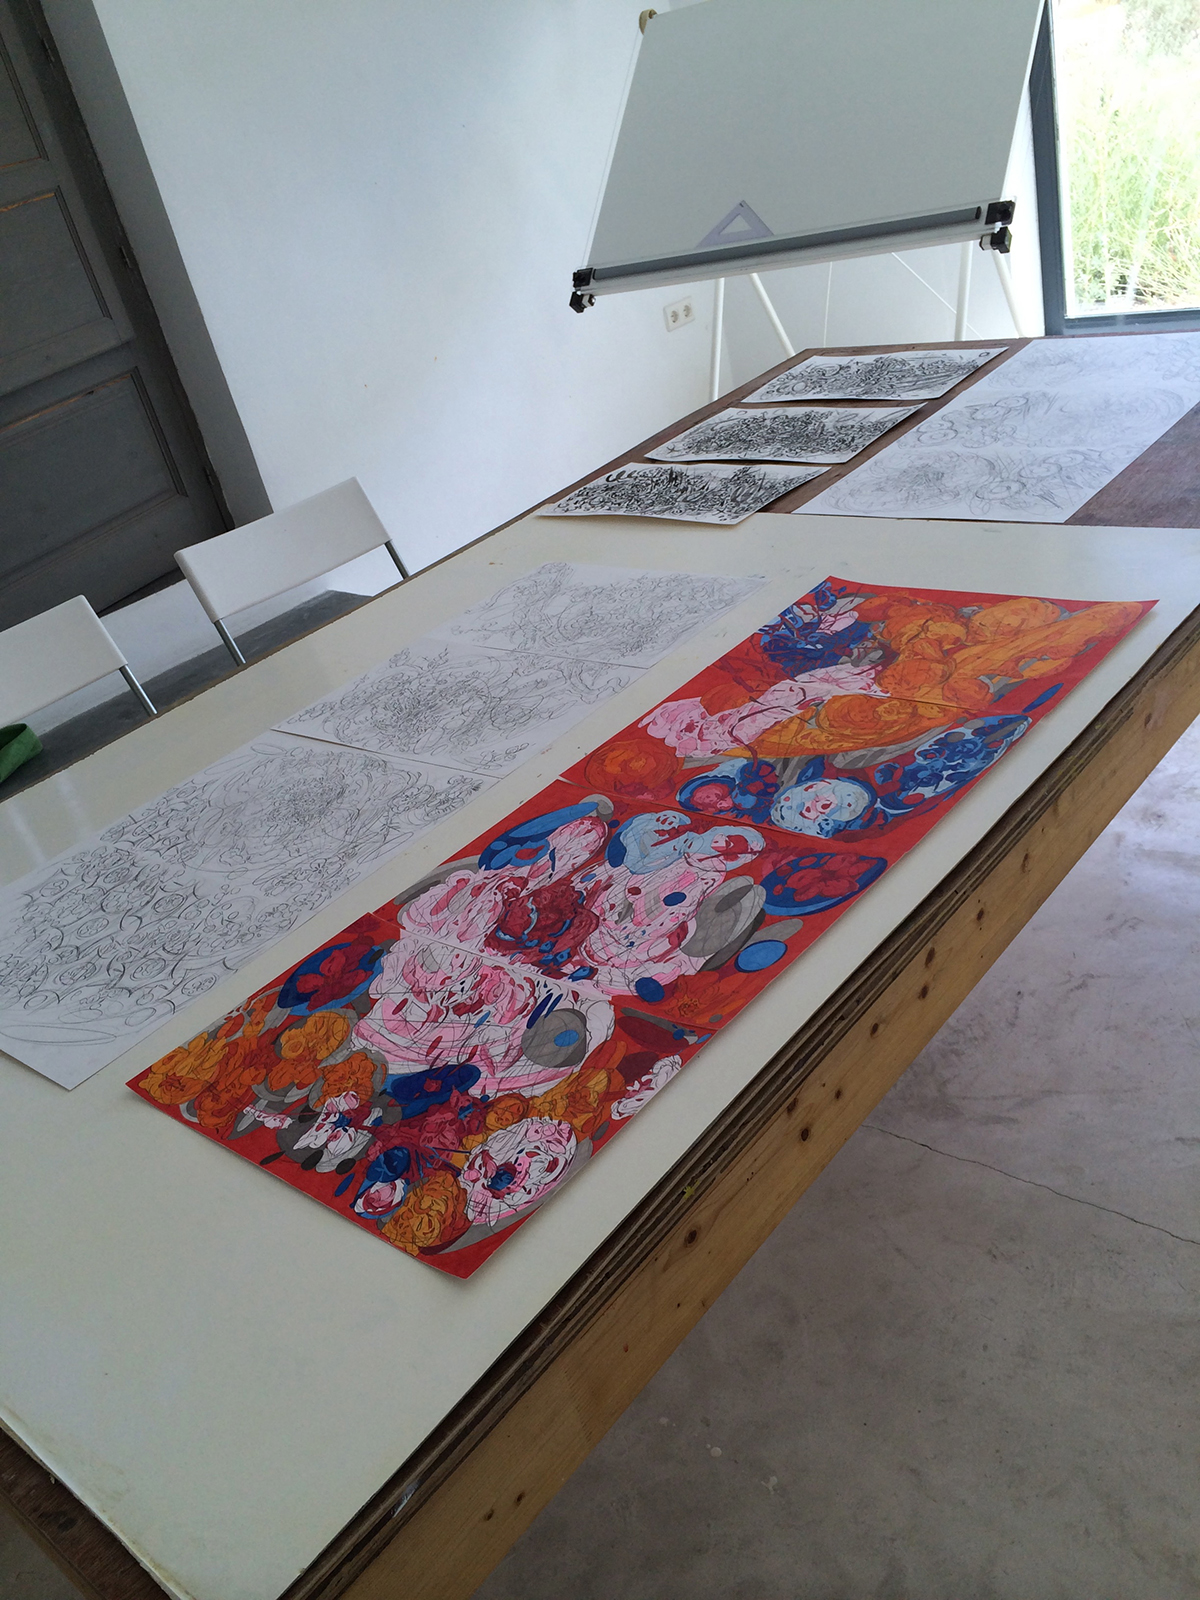 Artist's drawings in the studio.